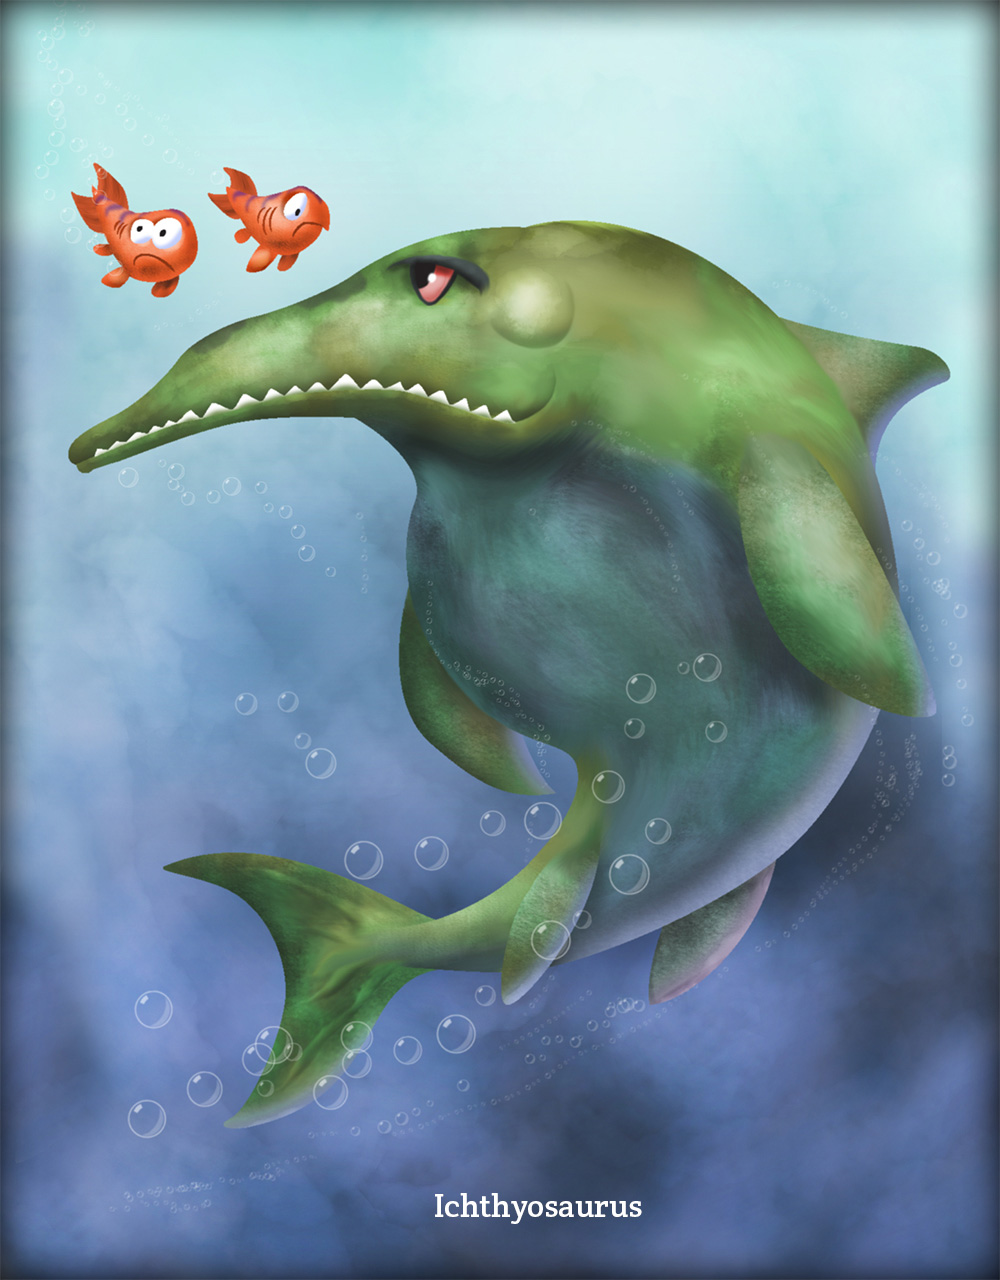 Ichthyosaurus1 Ichthyosaurus: Semi Big Reptile in a Very Large Pond